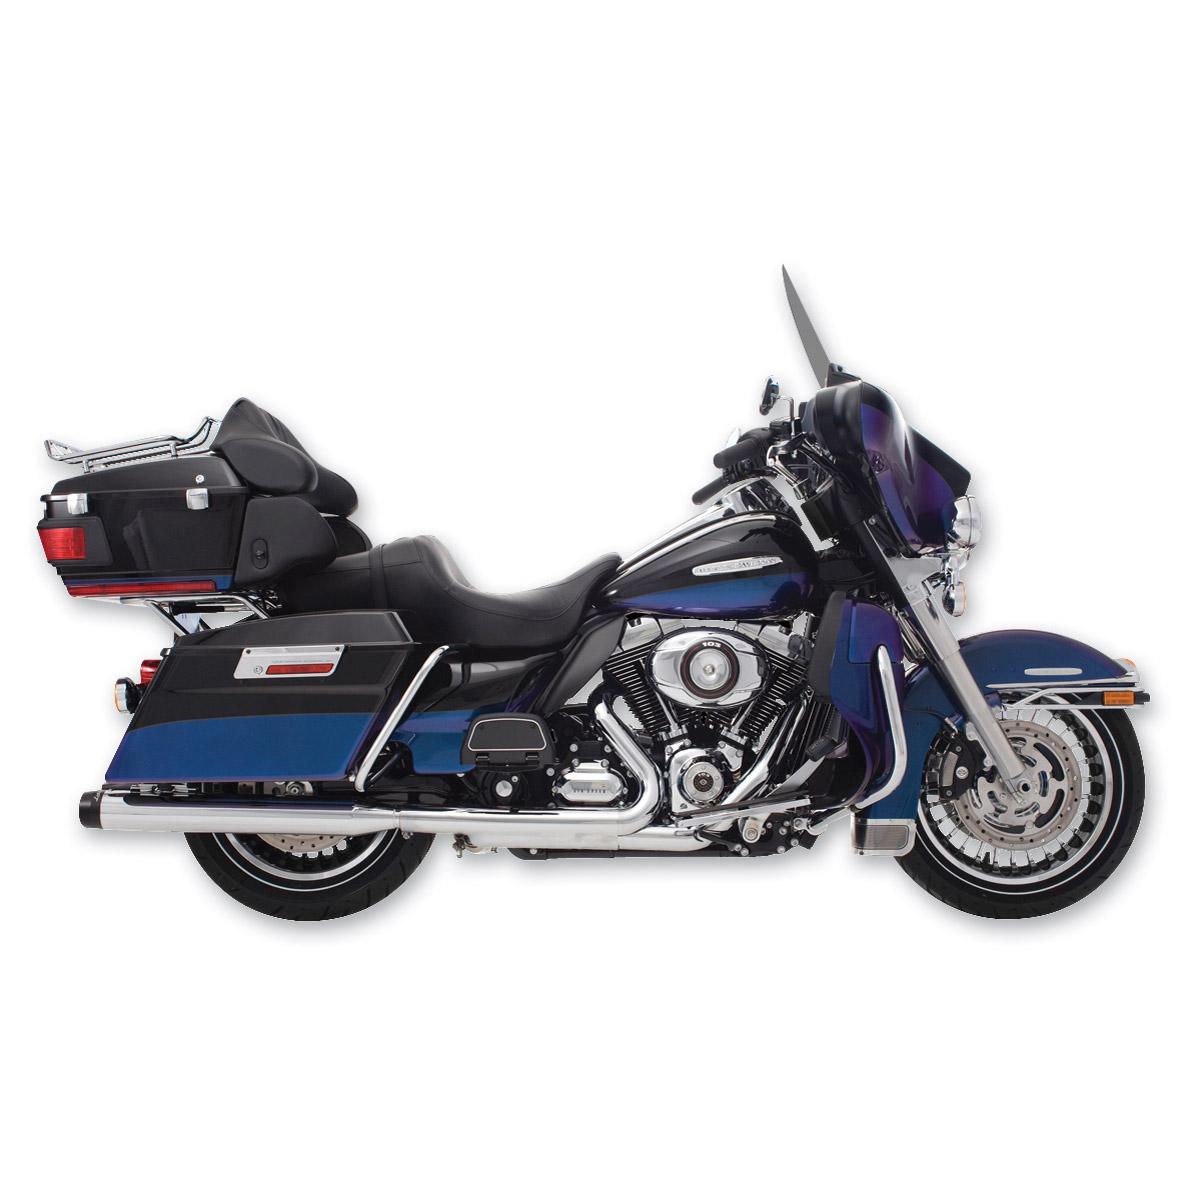 Harley Electra Glide Police Wiring Diagram on harley fatboy diagram, harley knucklehead diagram, harley sportster diagram,